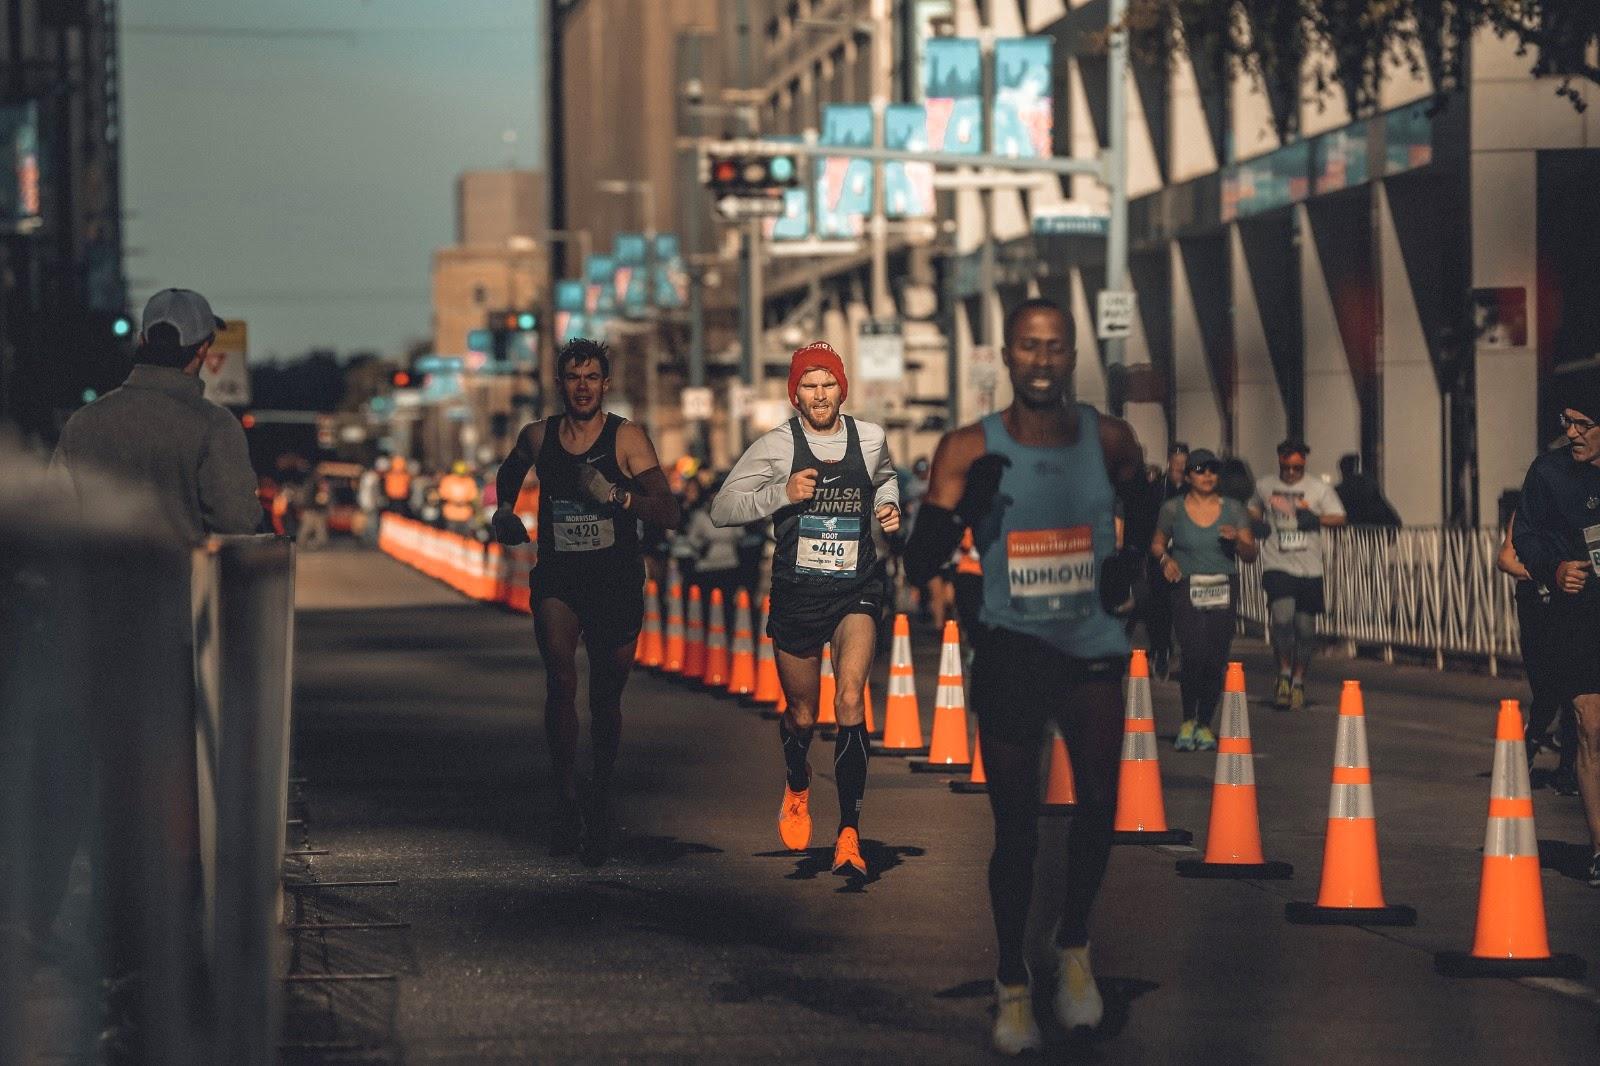 The finish at the Houston Marathon